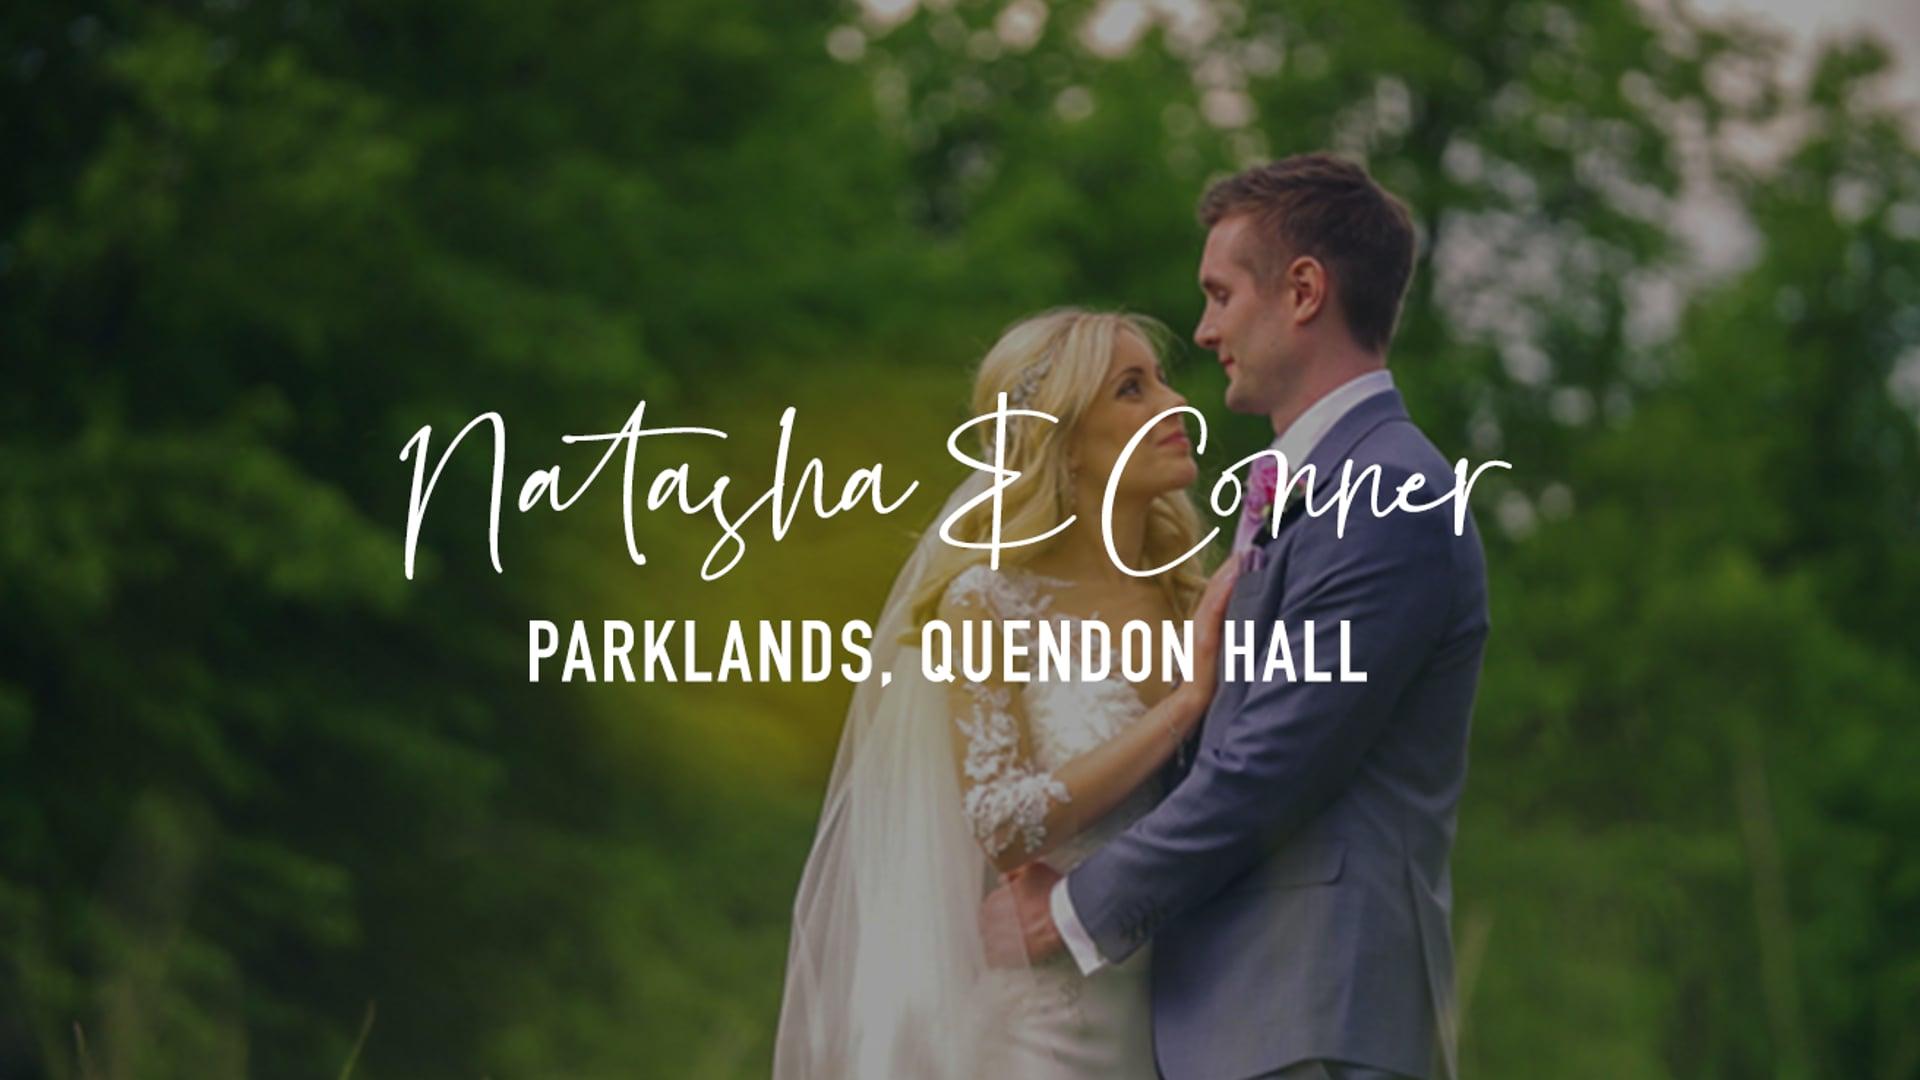 Natasha & Conner - Parklands Quendon Hall